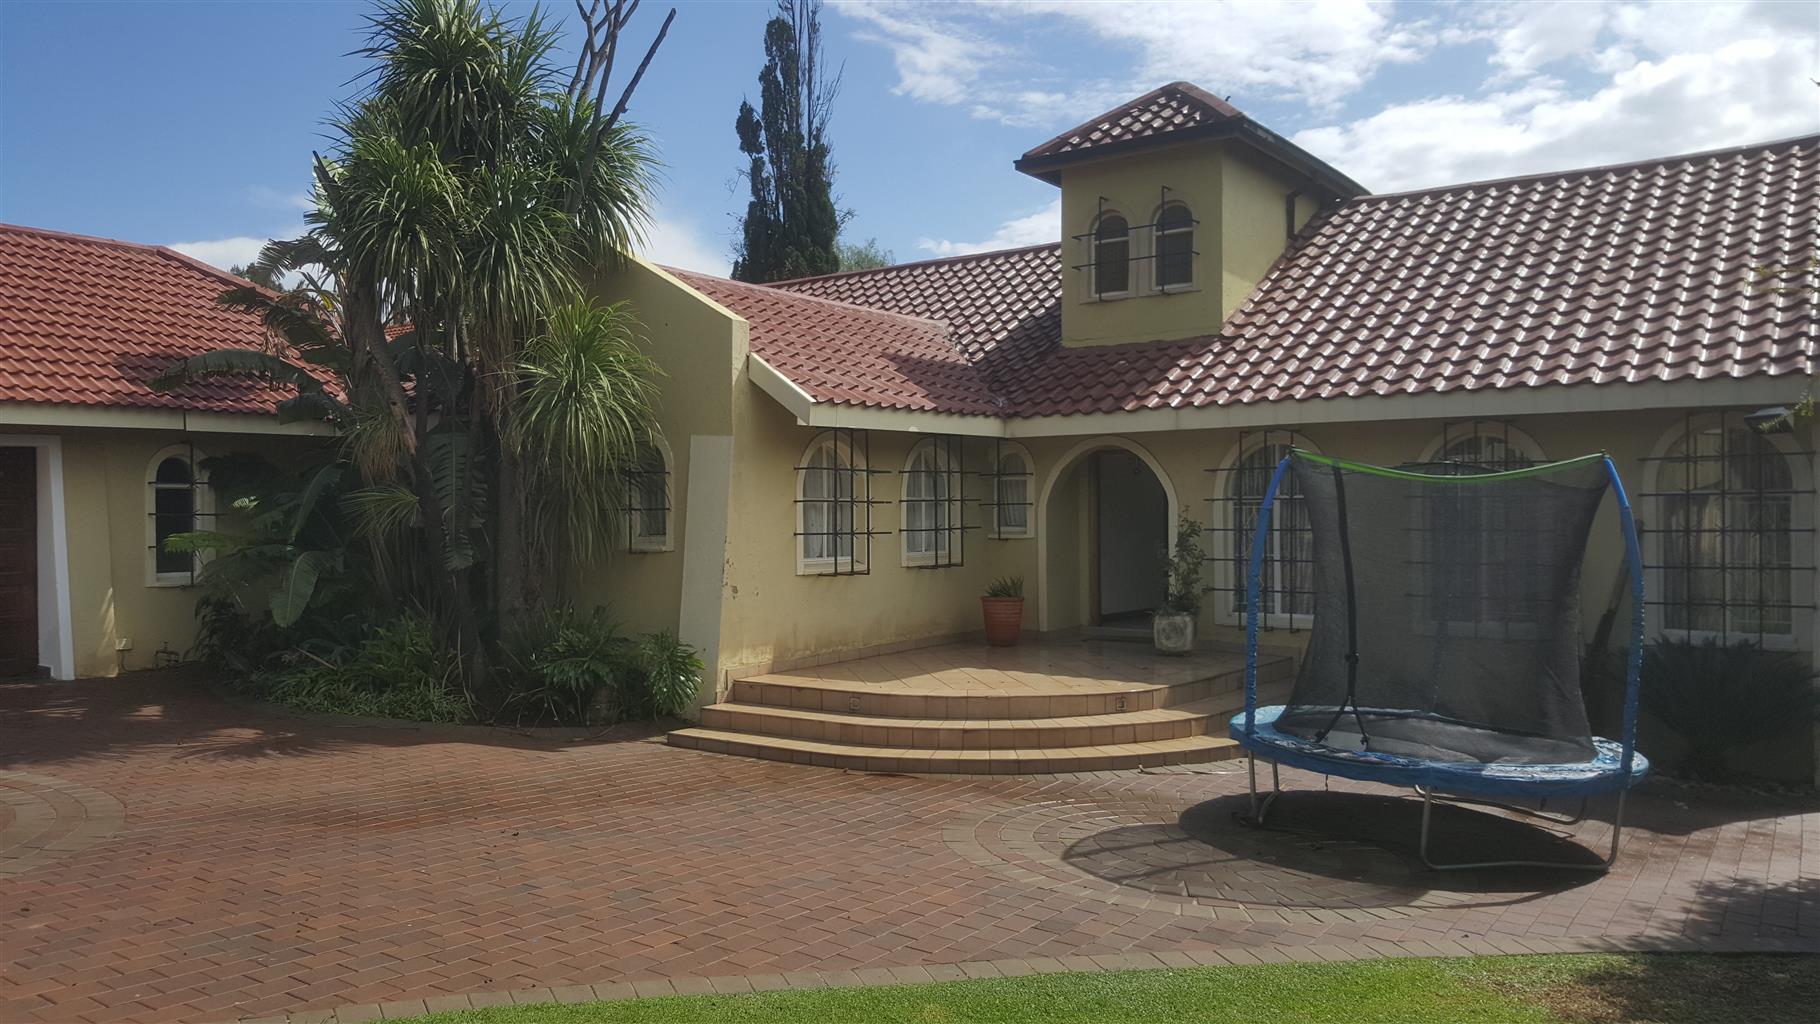 Glenanda, 4 Bedroom, 3 Bathroom, Johannesburg